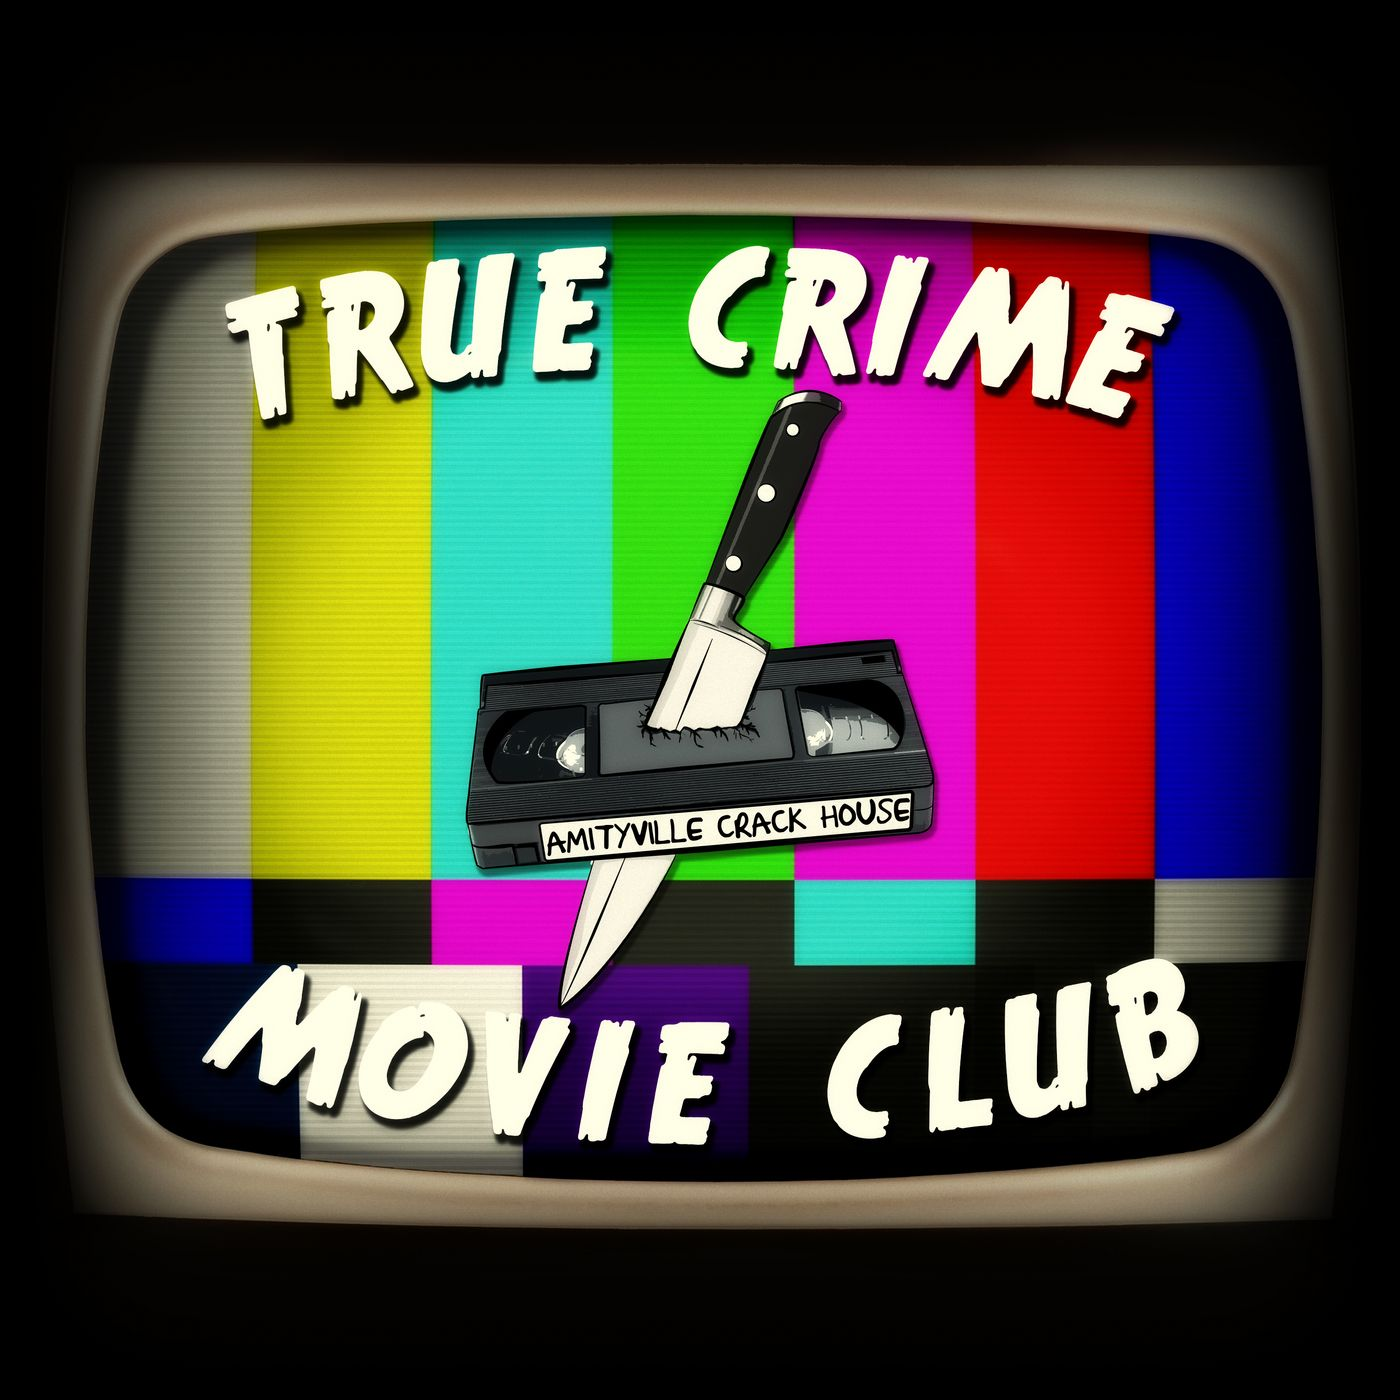 True Crime Movie Club